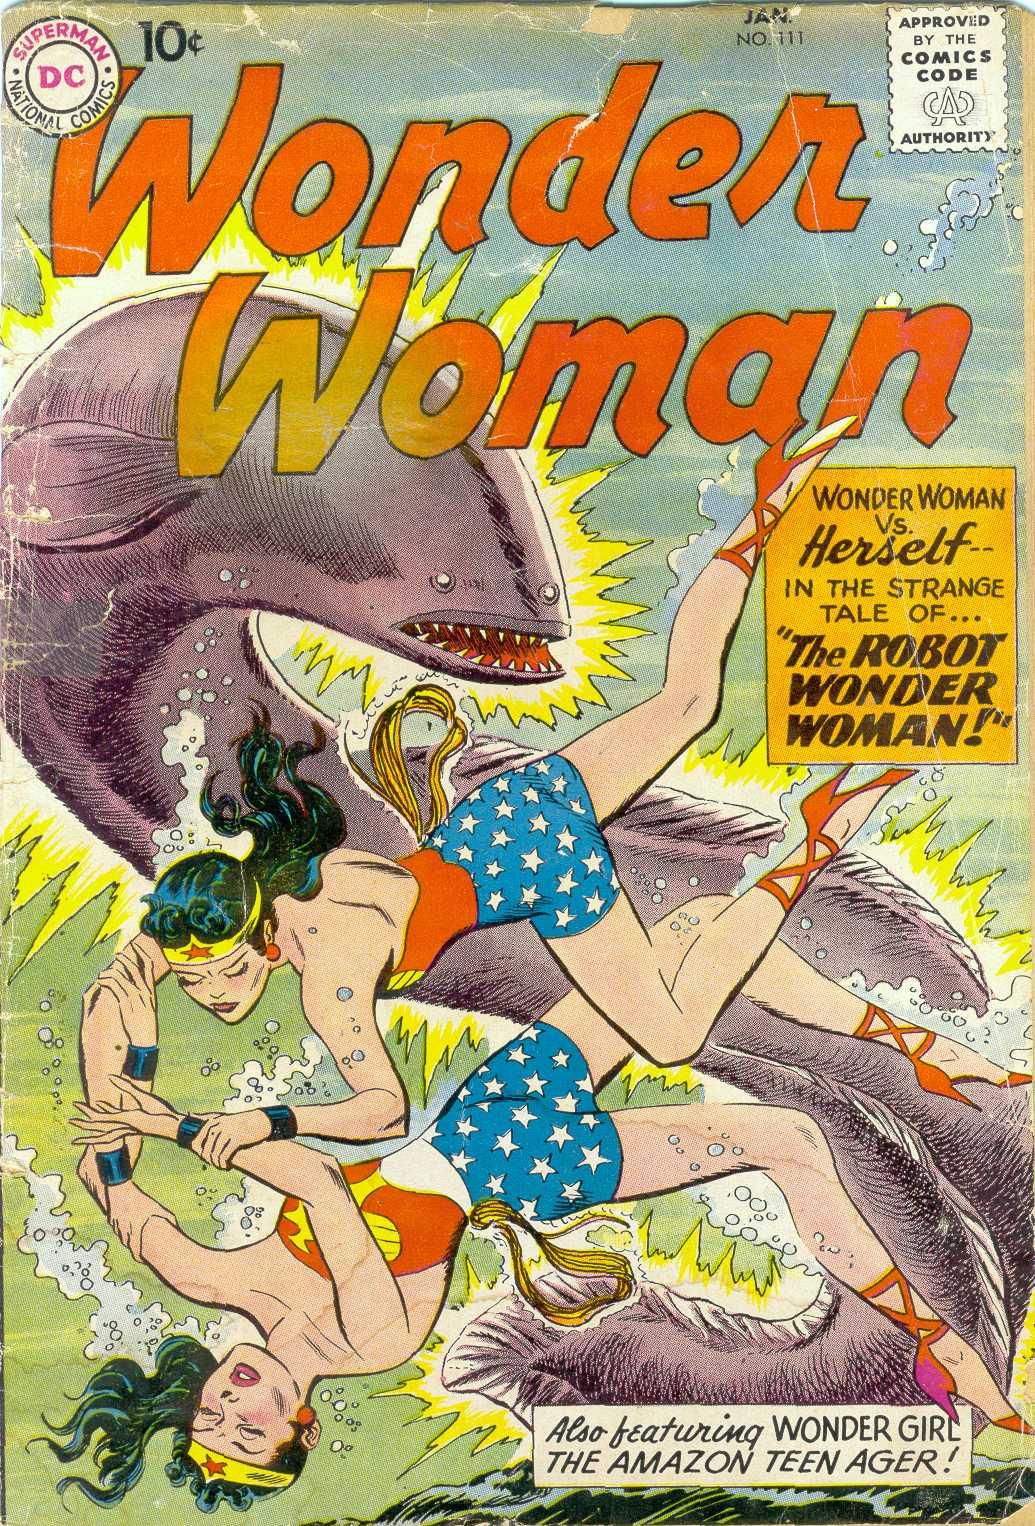 Read online Wonder Woman (1942) comic -  Issue #111 - 1